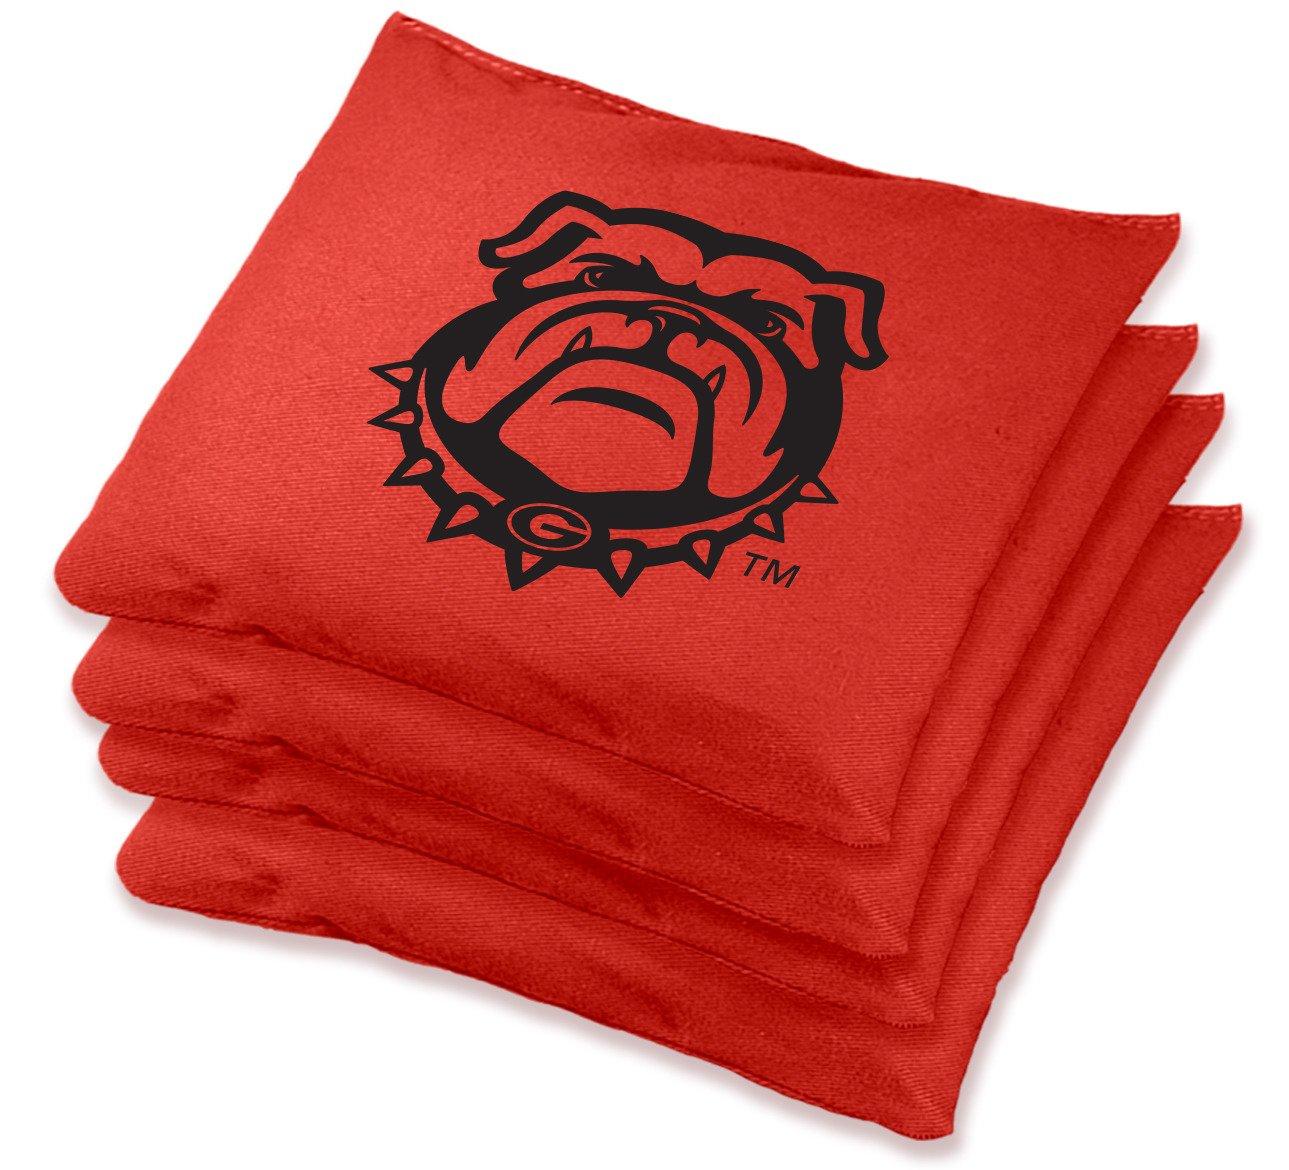 Wild Sports University of Georgia Regulation Beanbags 4-Pack